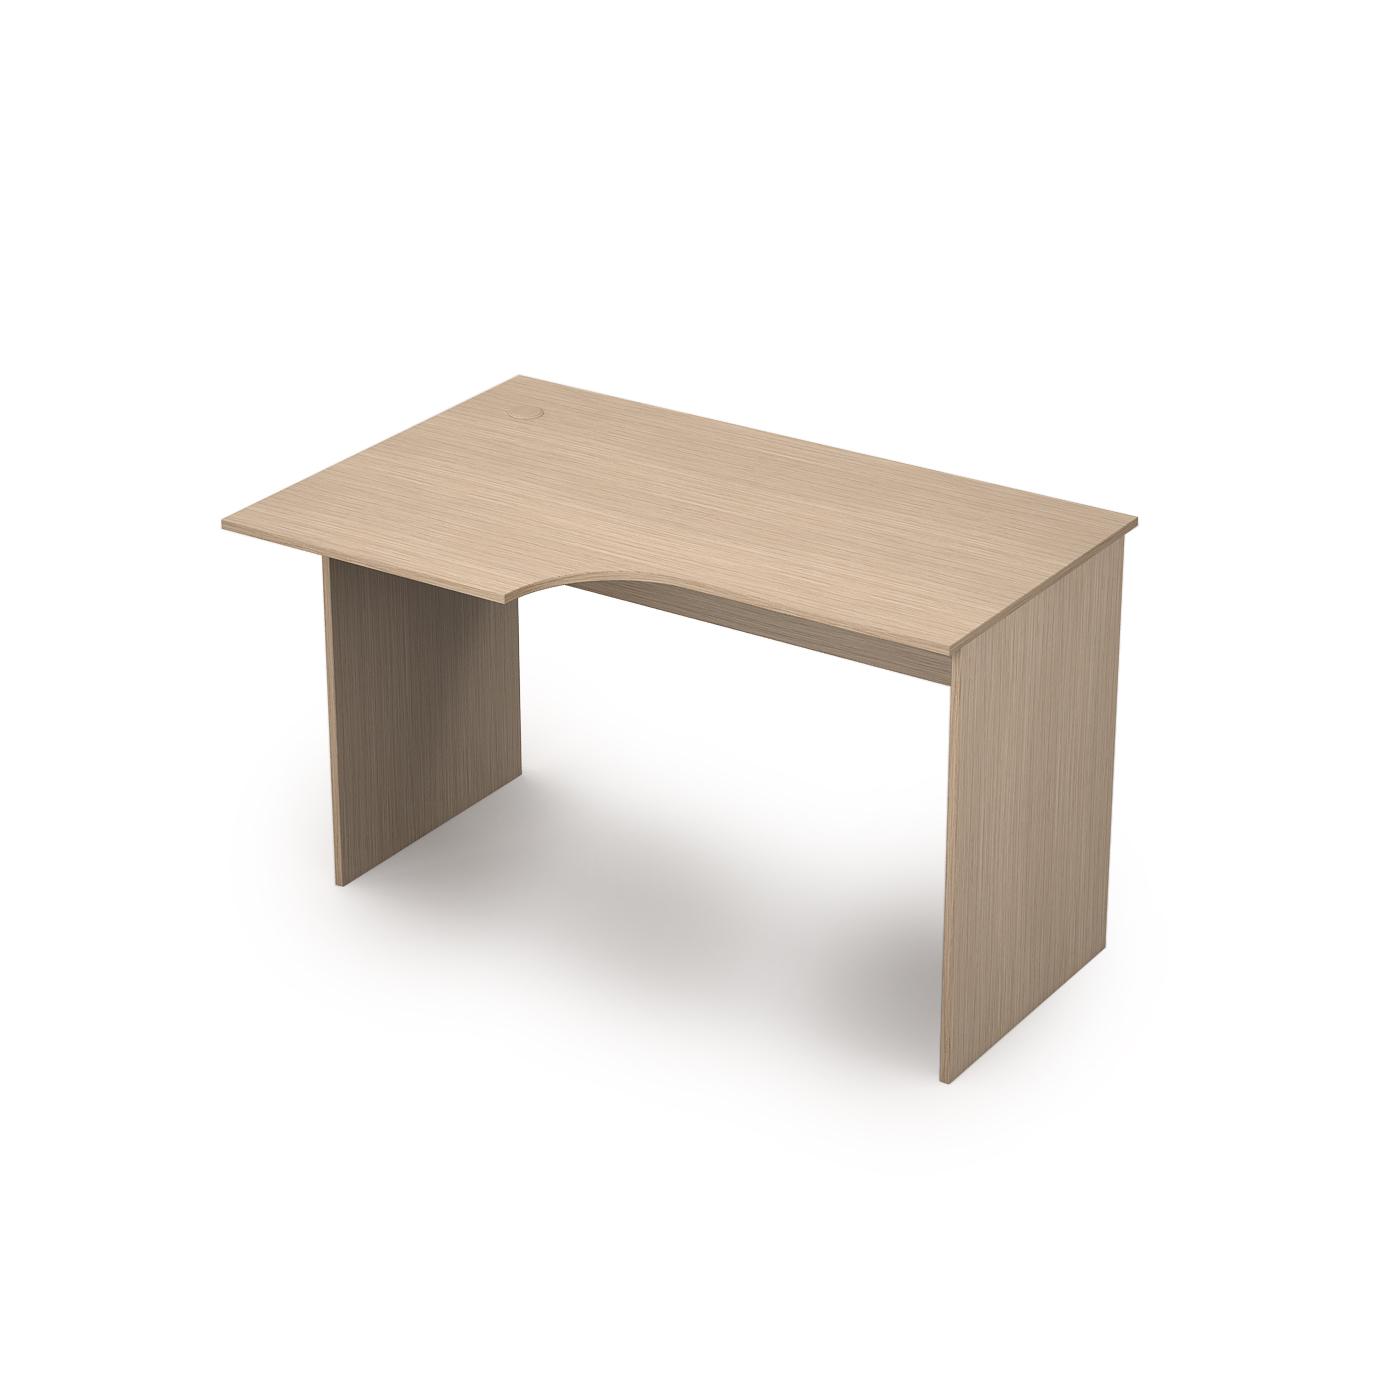 3С.041 Стол кривол. (лев.) (1200*800*750)